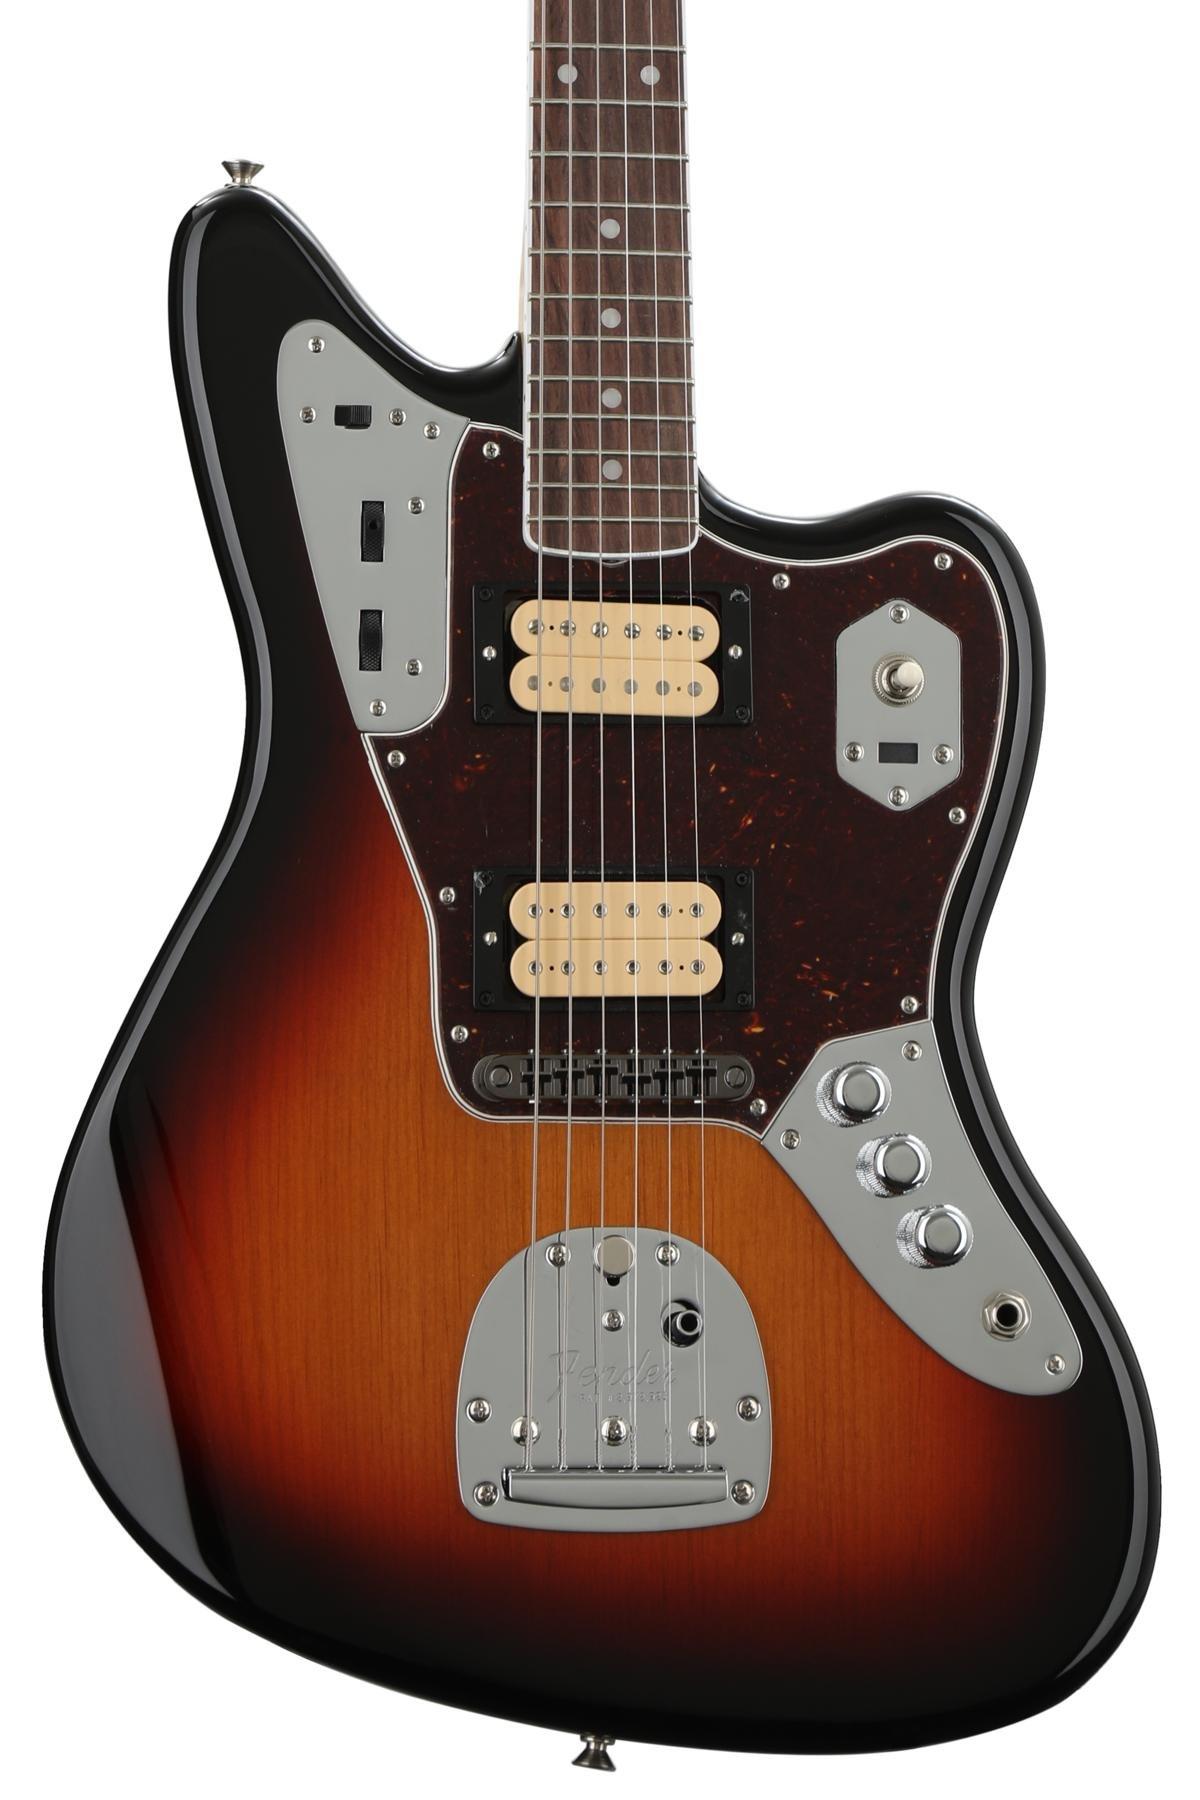 Fender Kurt Cobain Jaguar Nos 3 Tone Sunburst W Rosewood Lead Iii Wiring Diagram Fingerboard Image 1